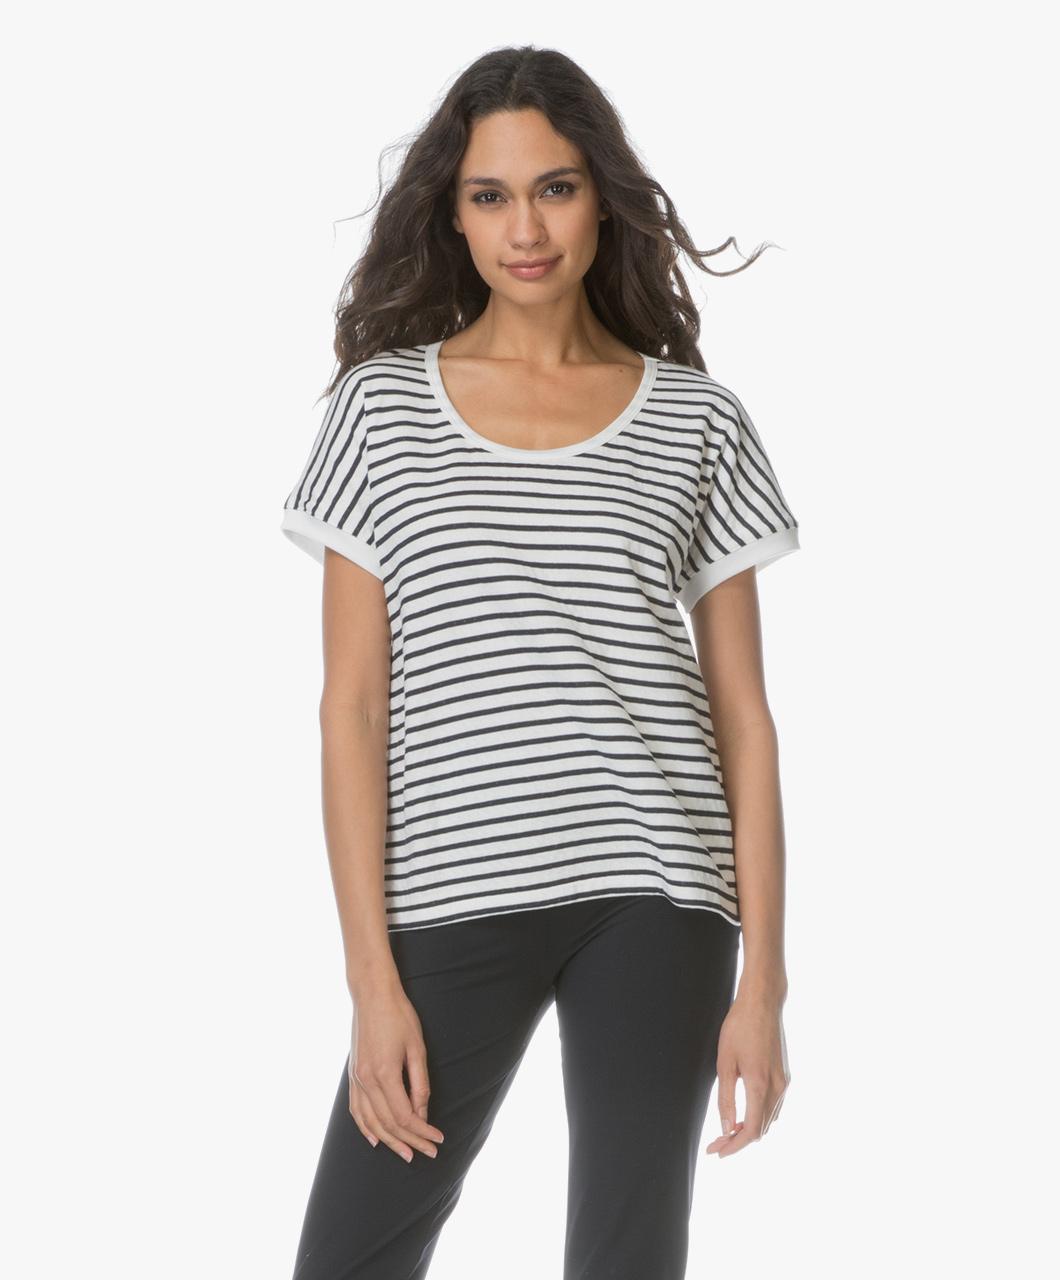 Petit bateau striped t shirt marshmallow smoking 28036 for Petit bateau striped shirt